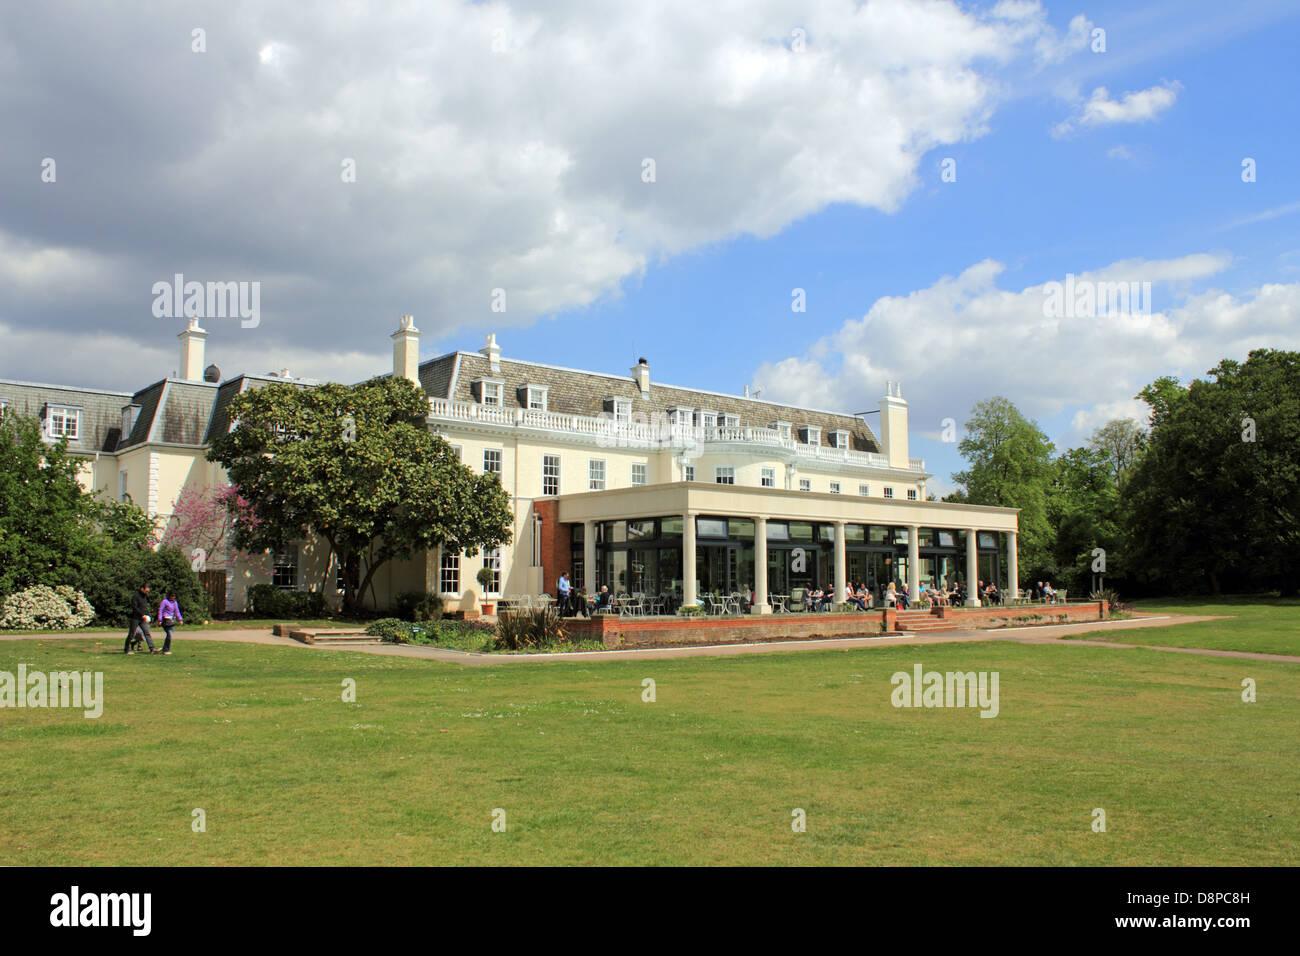 Cannizaro House Hotel Wimbledon